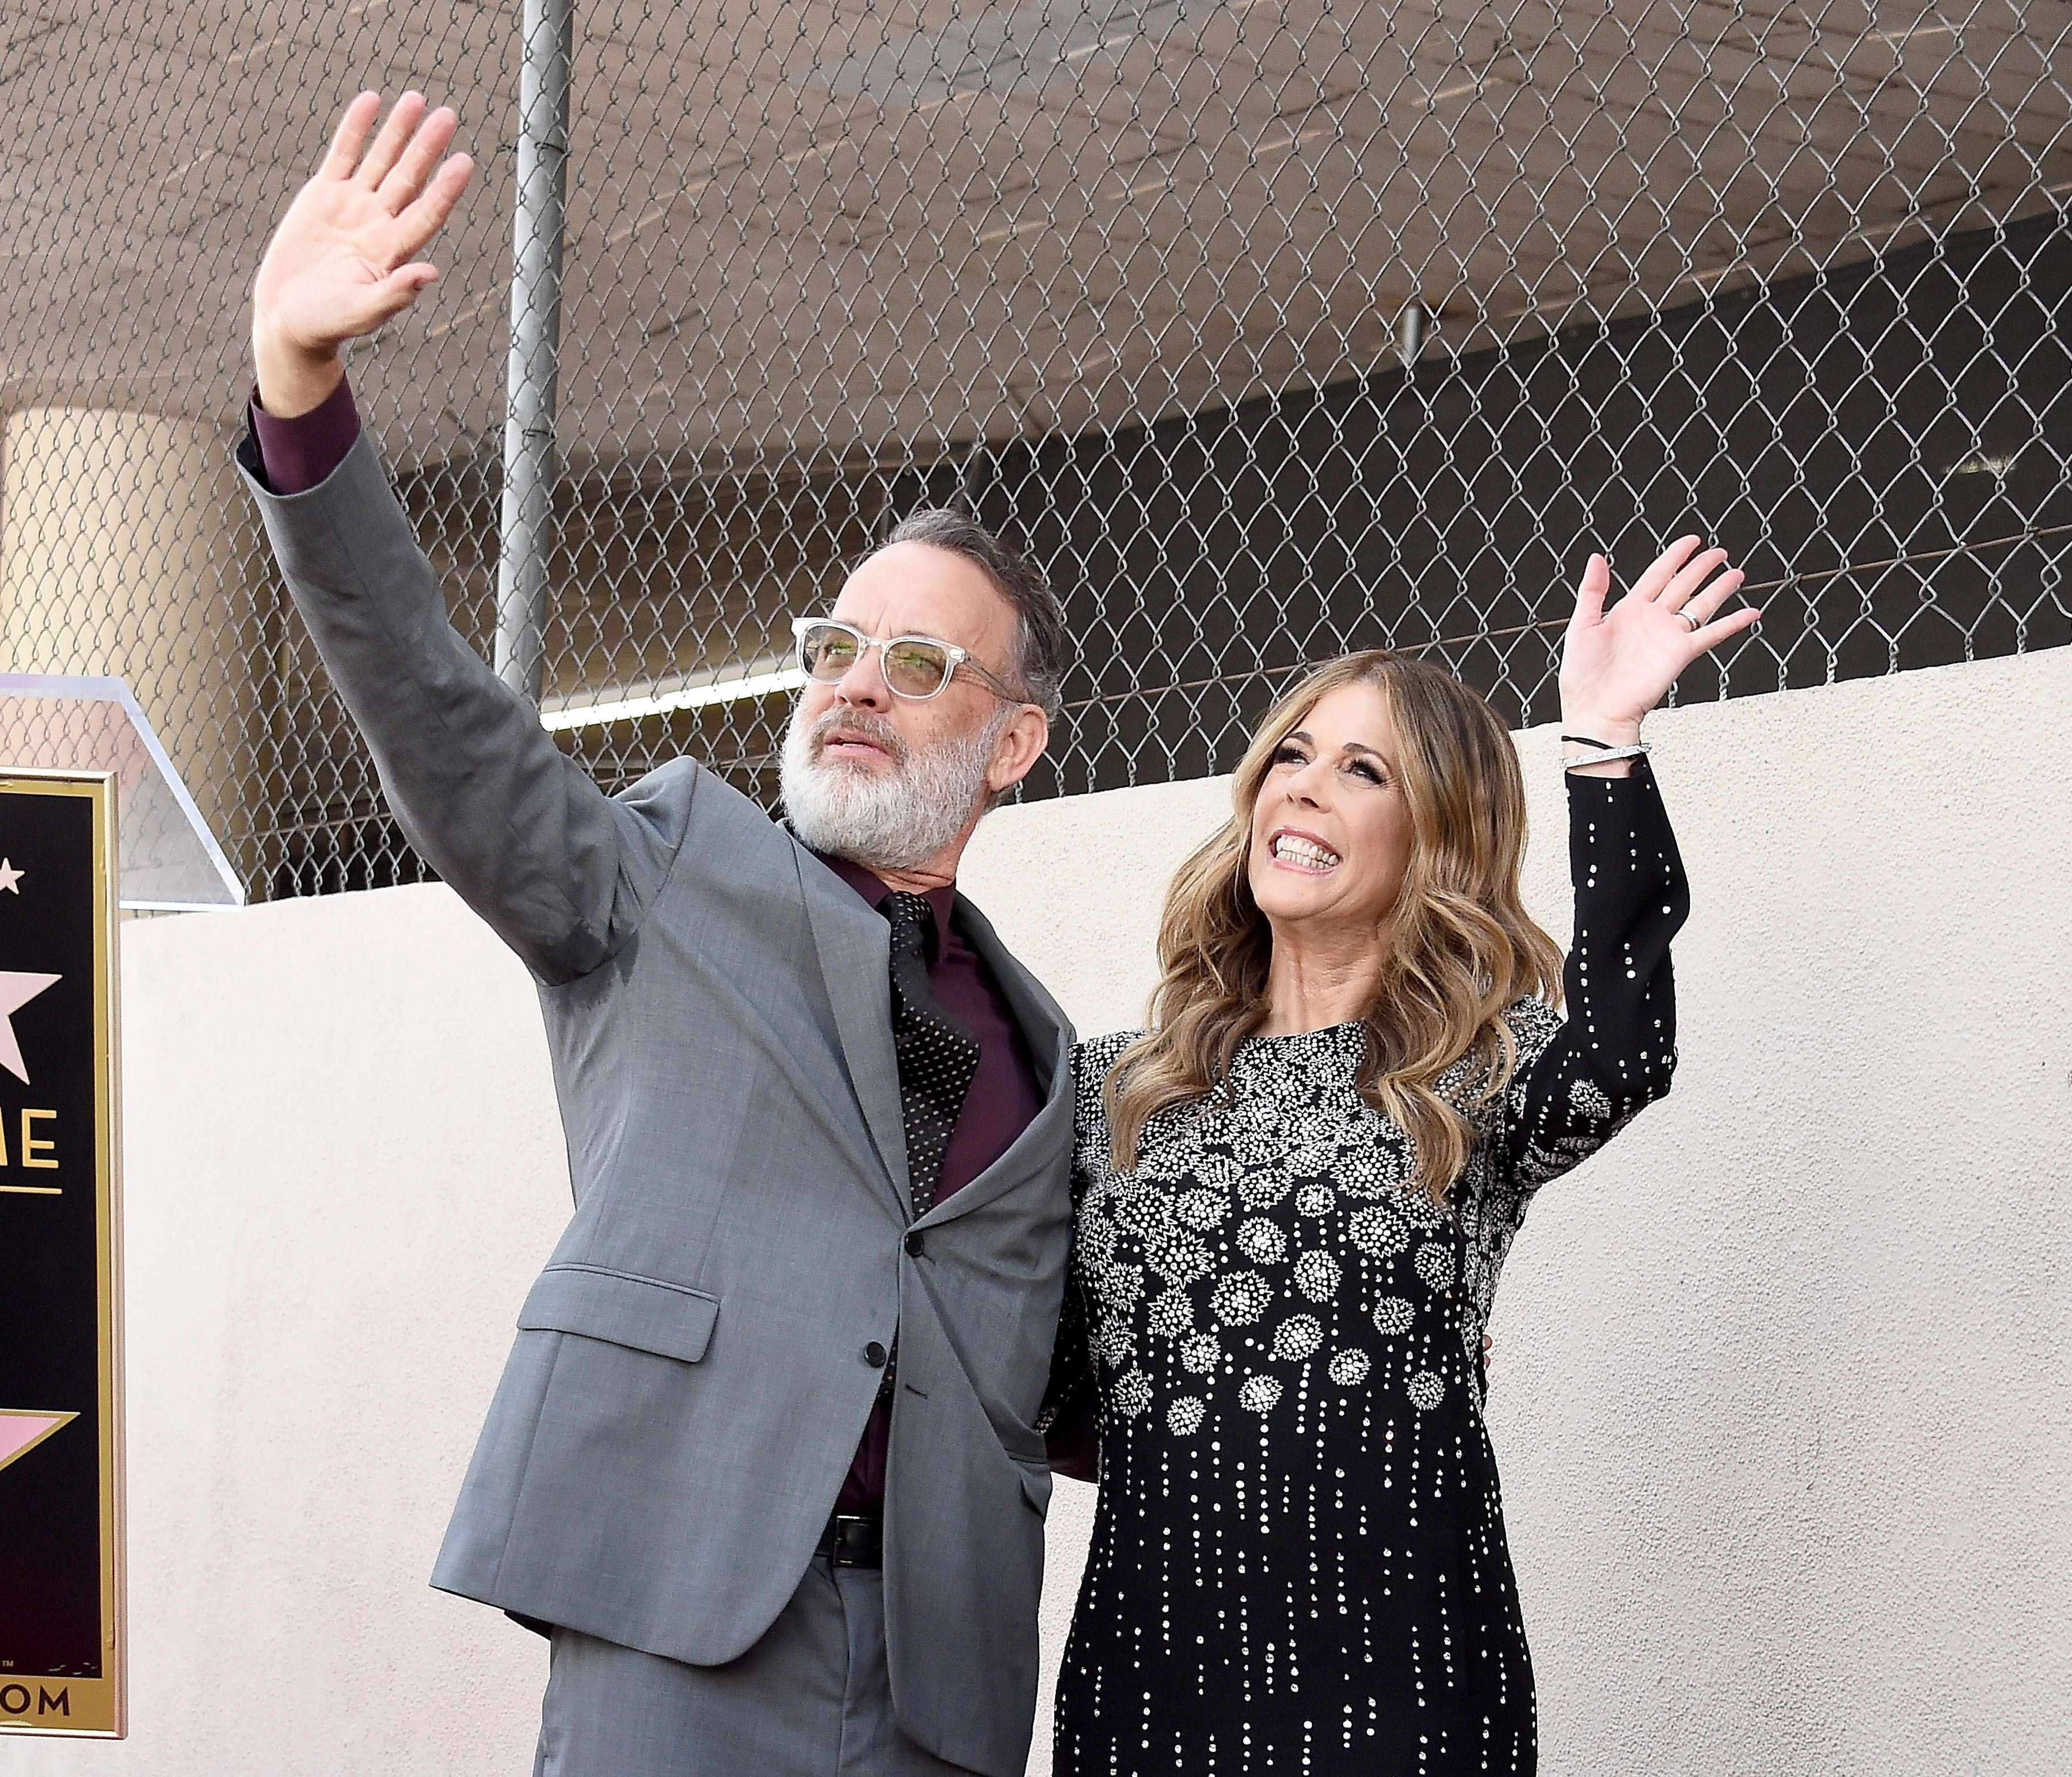 Tom Hanks and Rita Wilson Are Back in LA After Their Coronavirus Quarantine